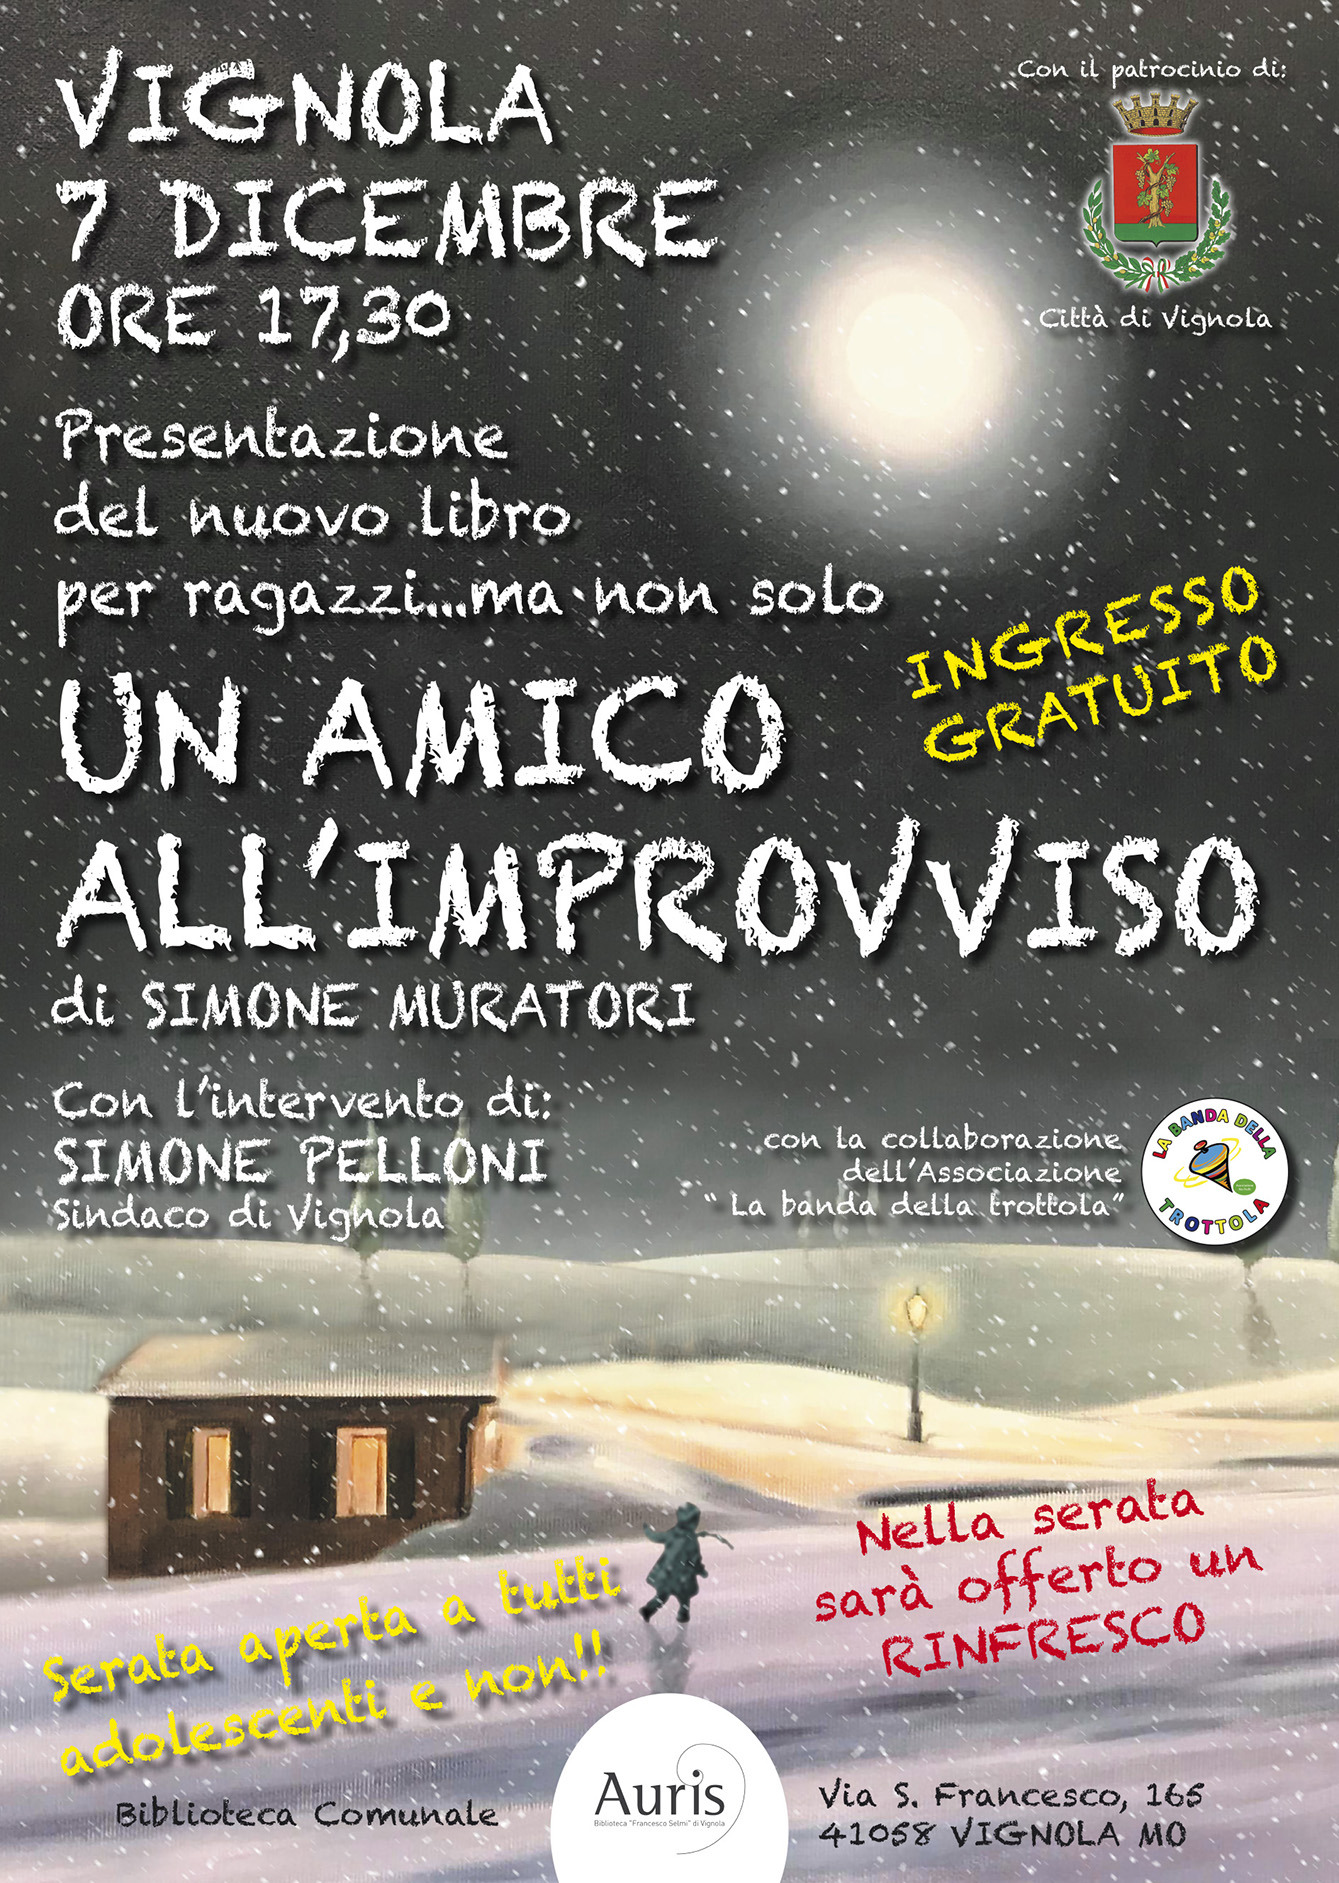 LOCANDINE AMICO IMPROVVISO AURIS Vignola